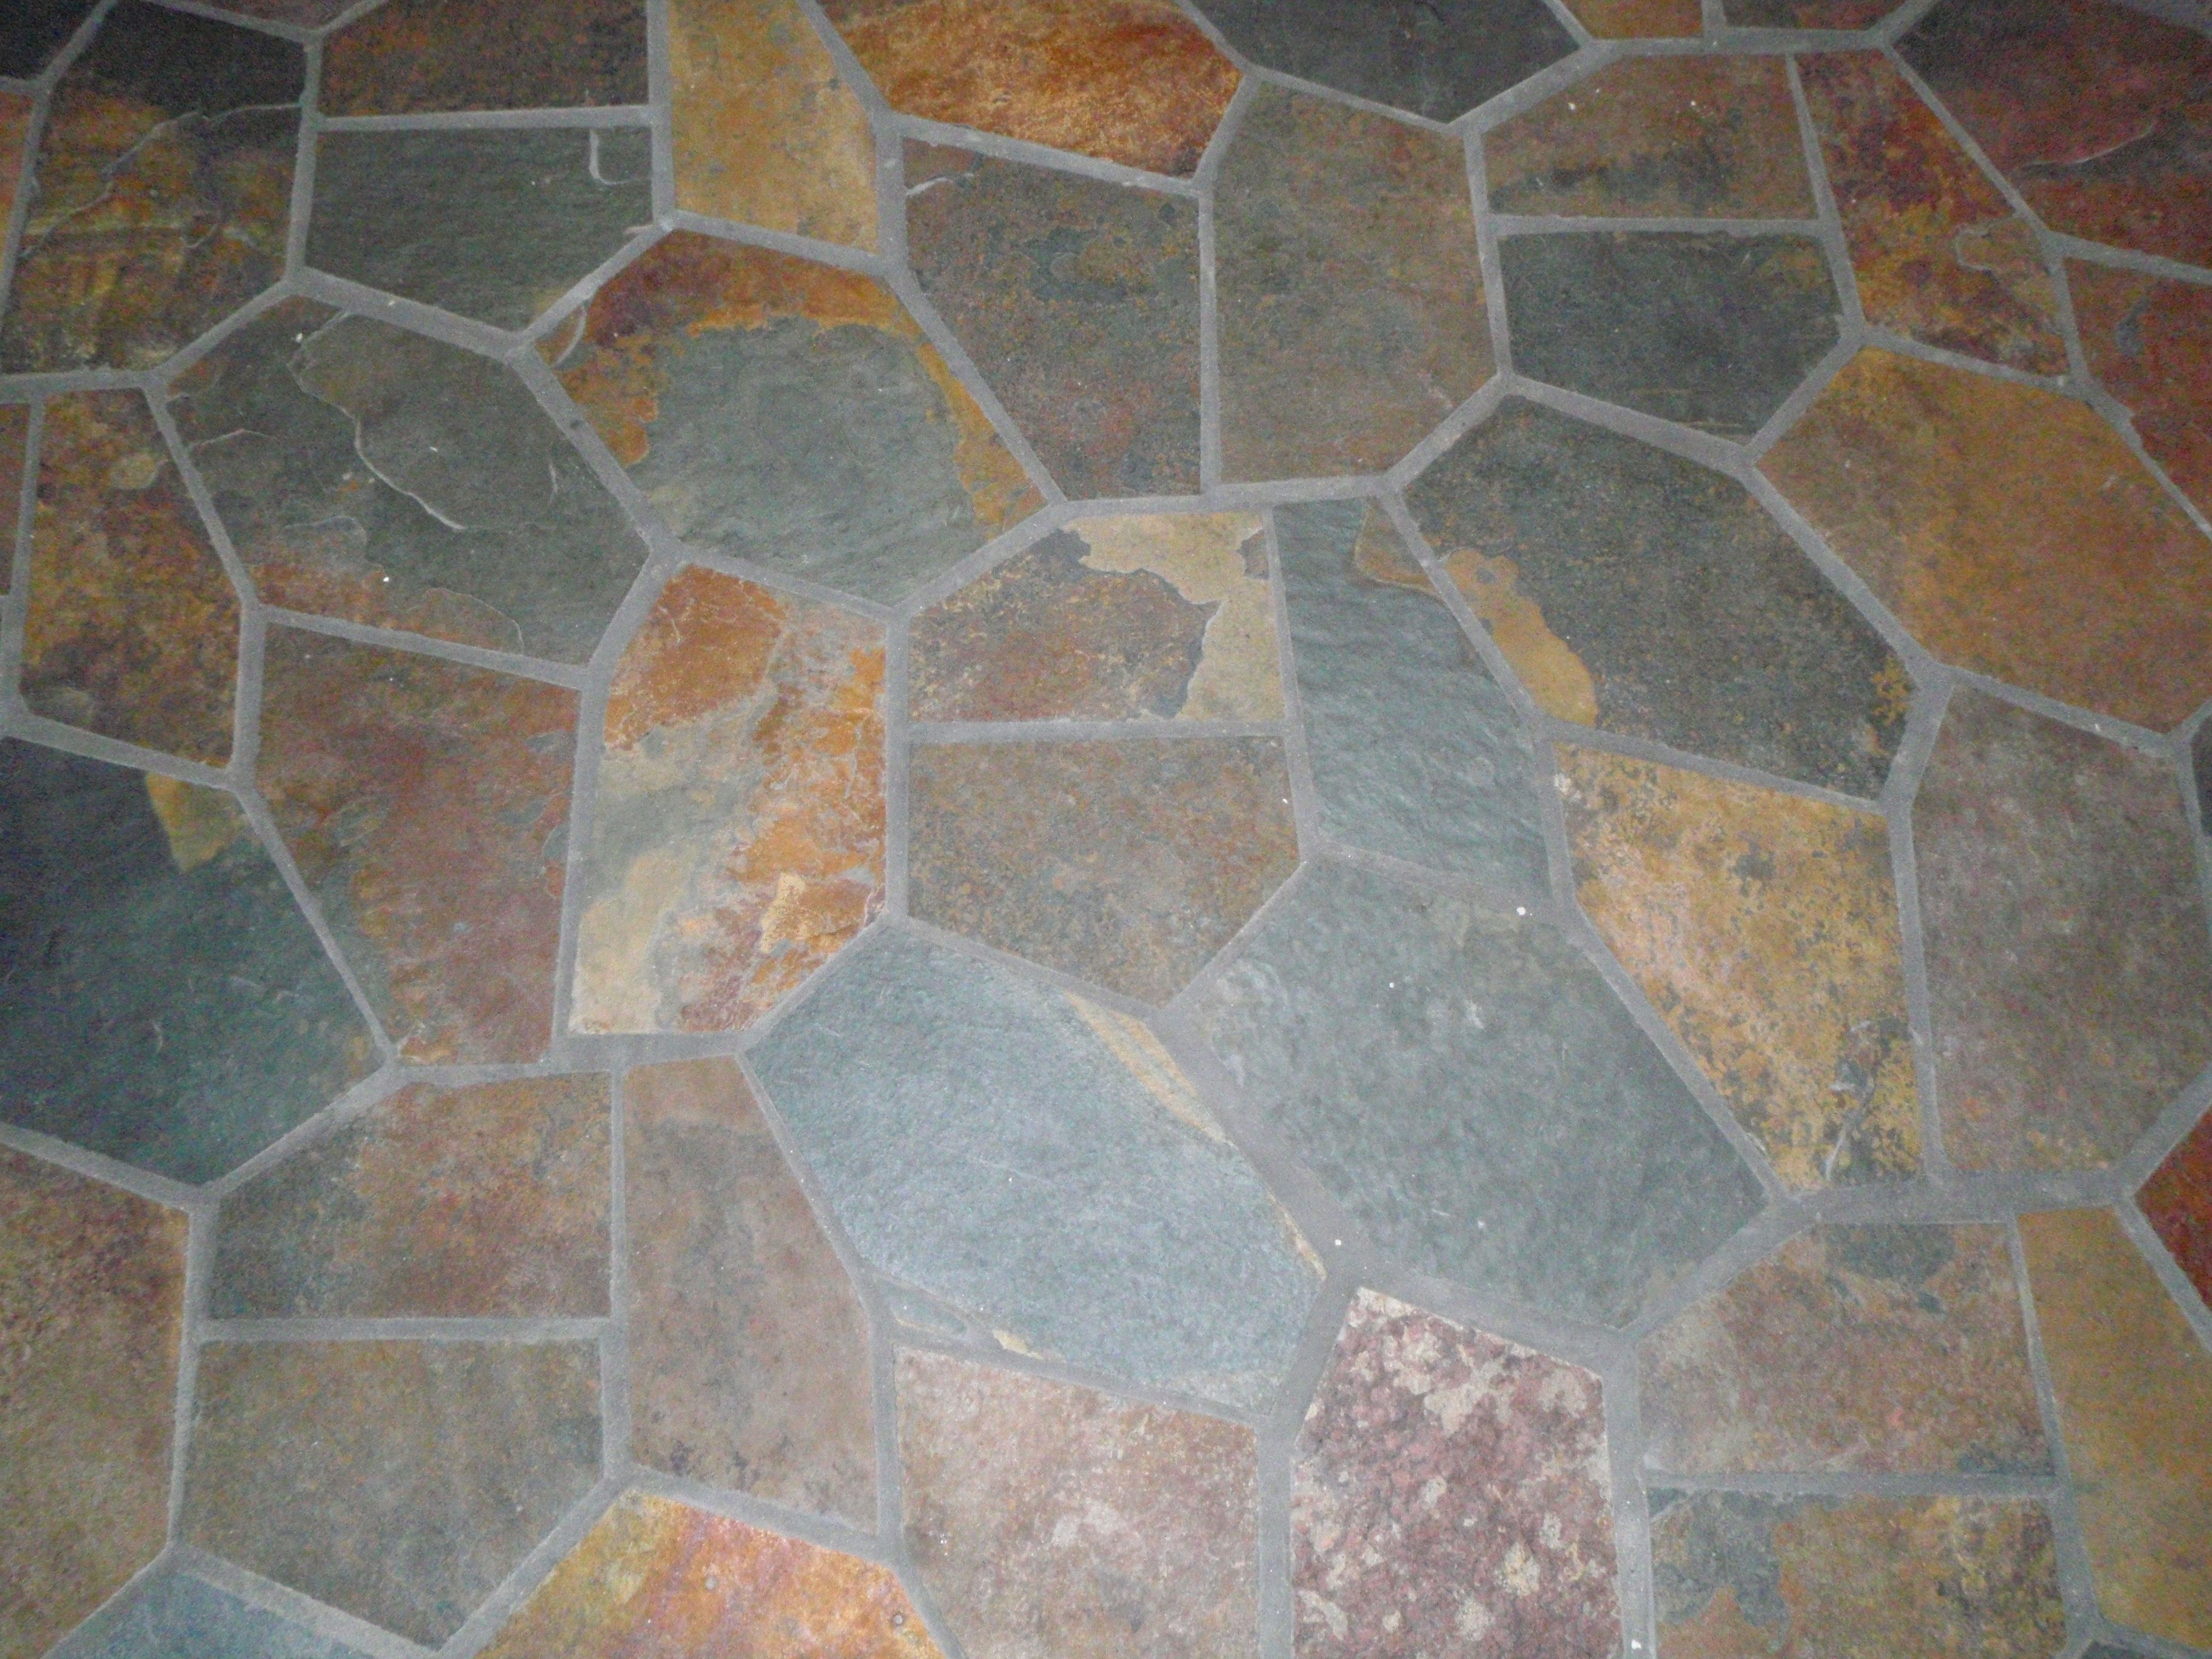 Slate flooring random slate tile with heated floor home slate flooring random slate tile with heated floor dailygadgetfo Image collections